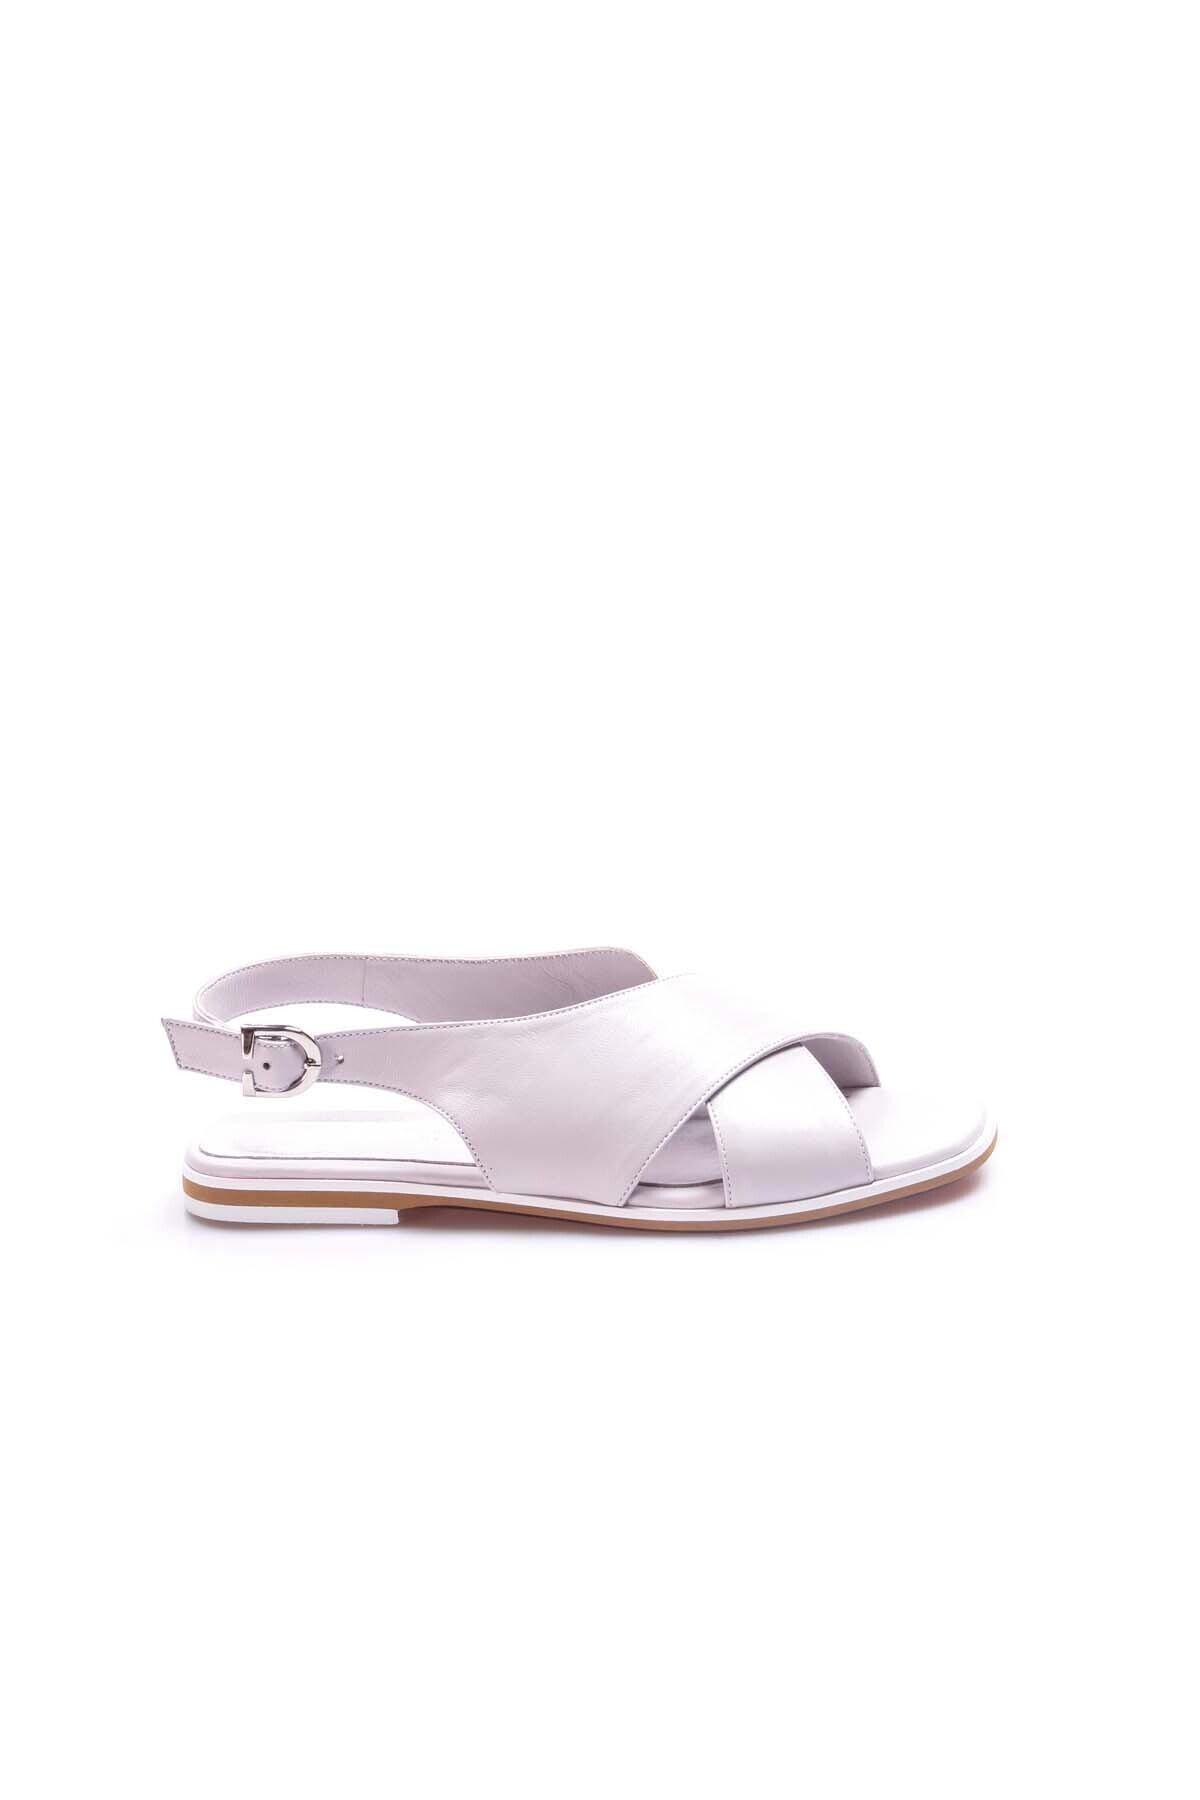 FAST STEP Kadın Lila Hakiki Deri Klasik Sandalet 888za306